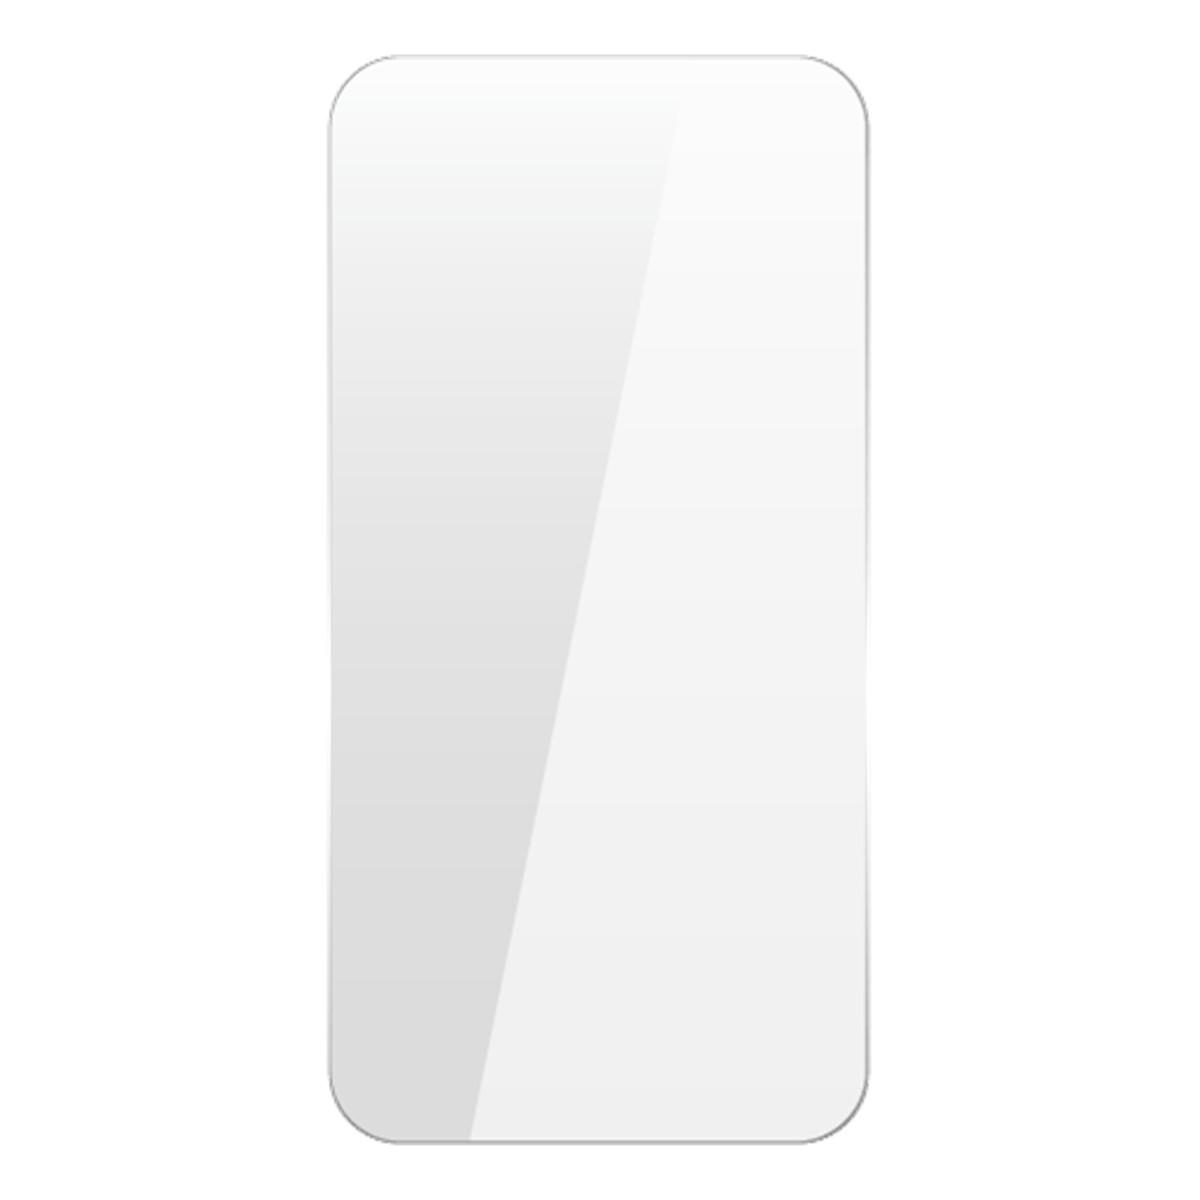 DELTACO screen protector, Xiaomi Redmi 8/8A, 2.5D full coverage glass